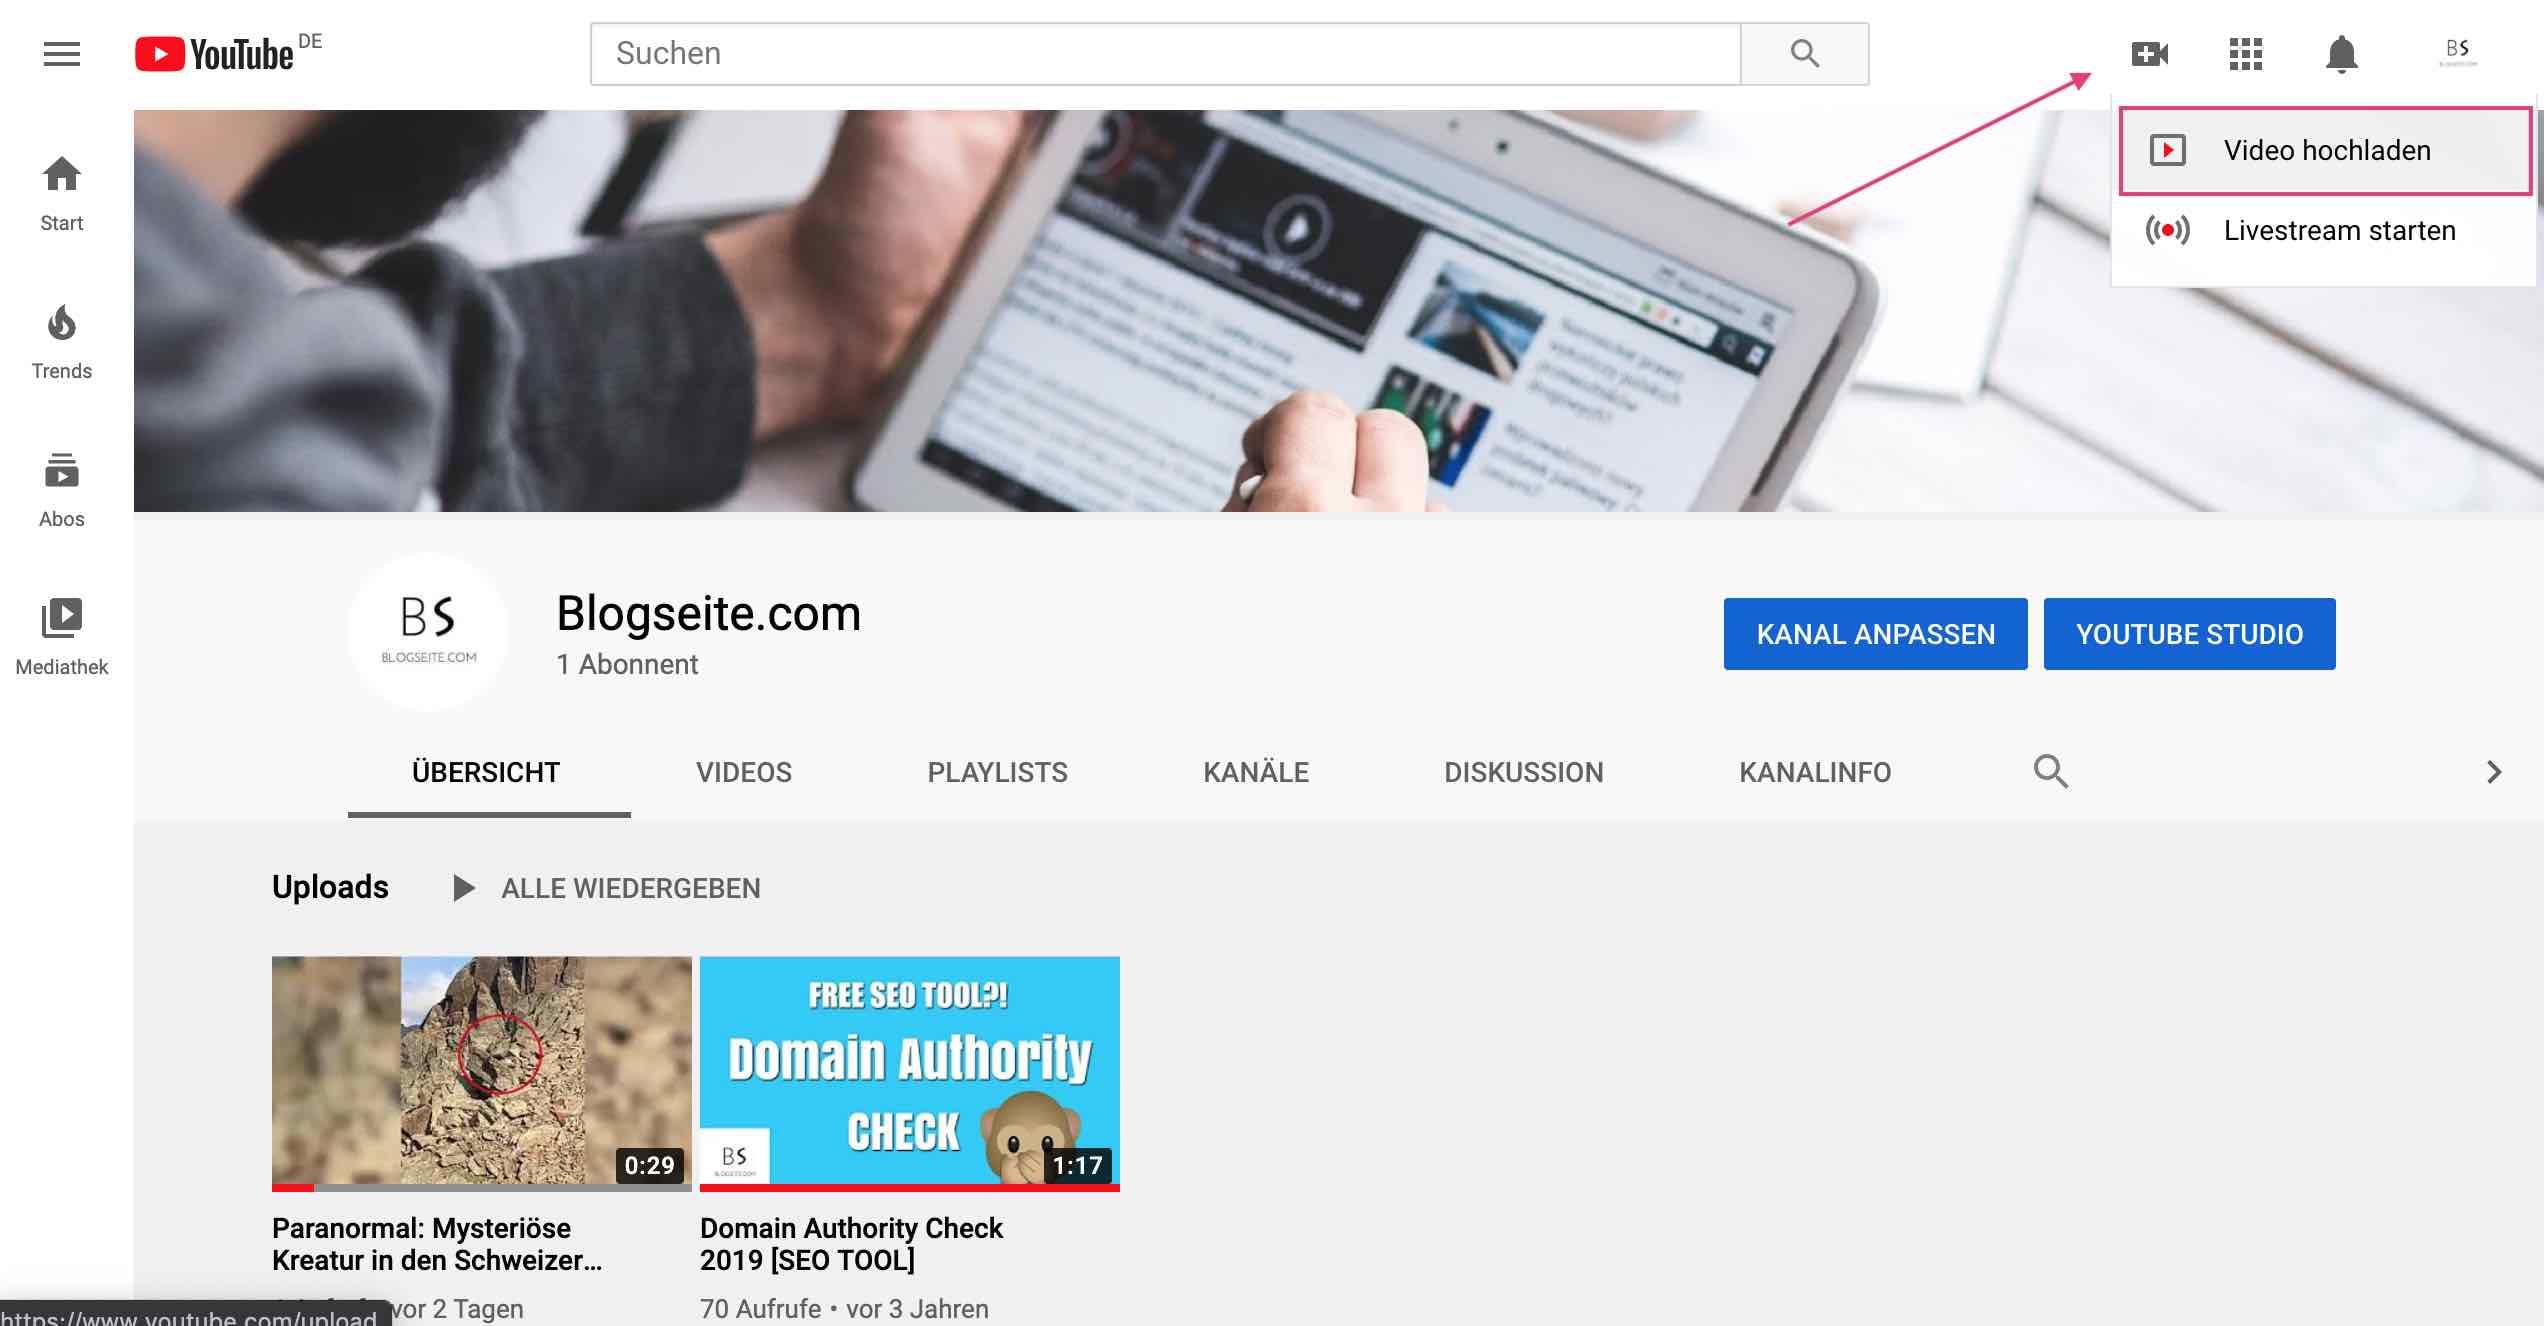 Youtube Account Video hochladen